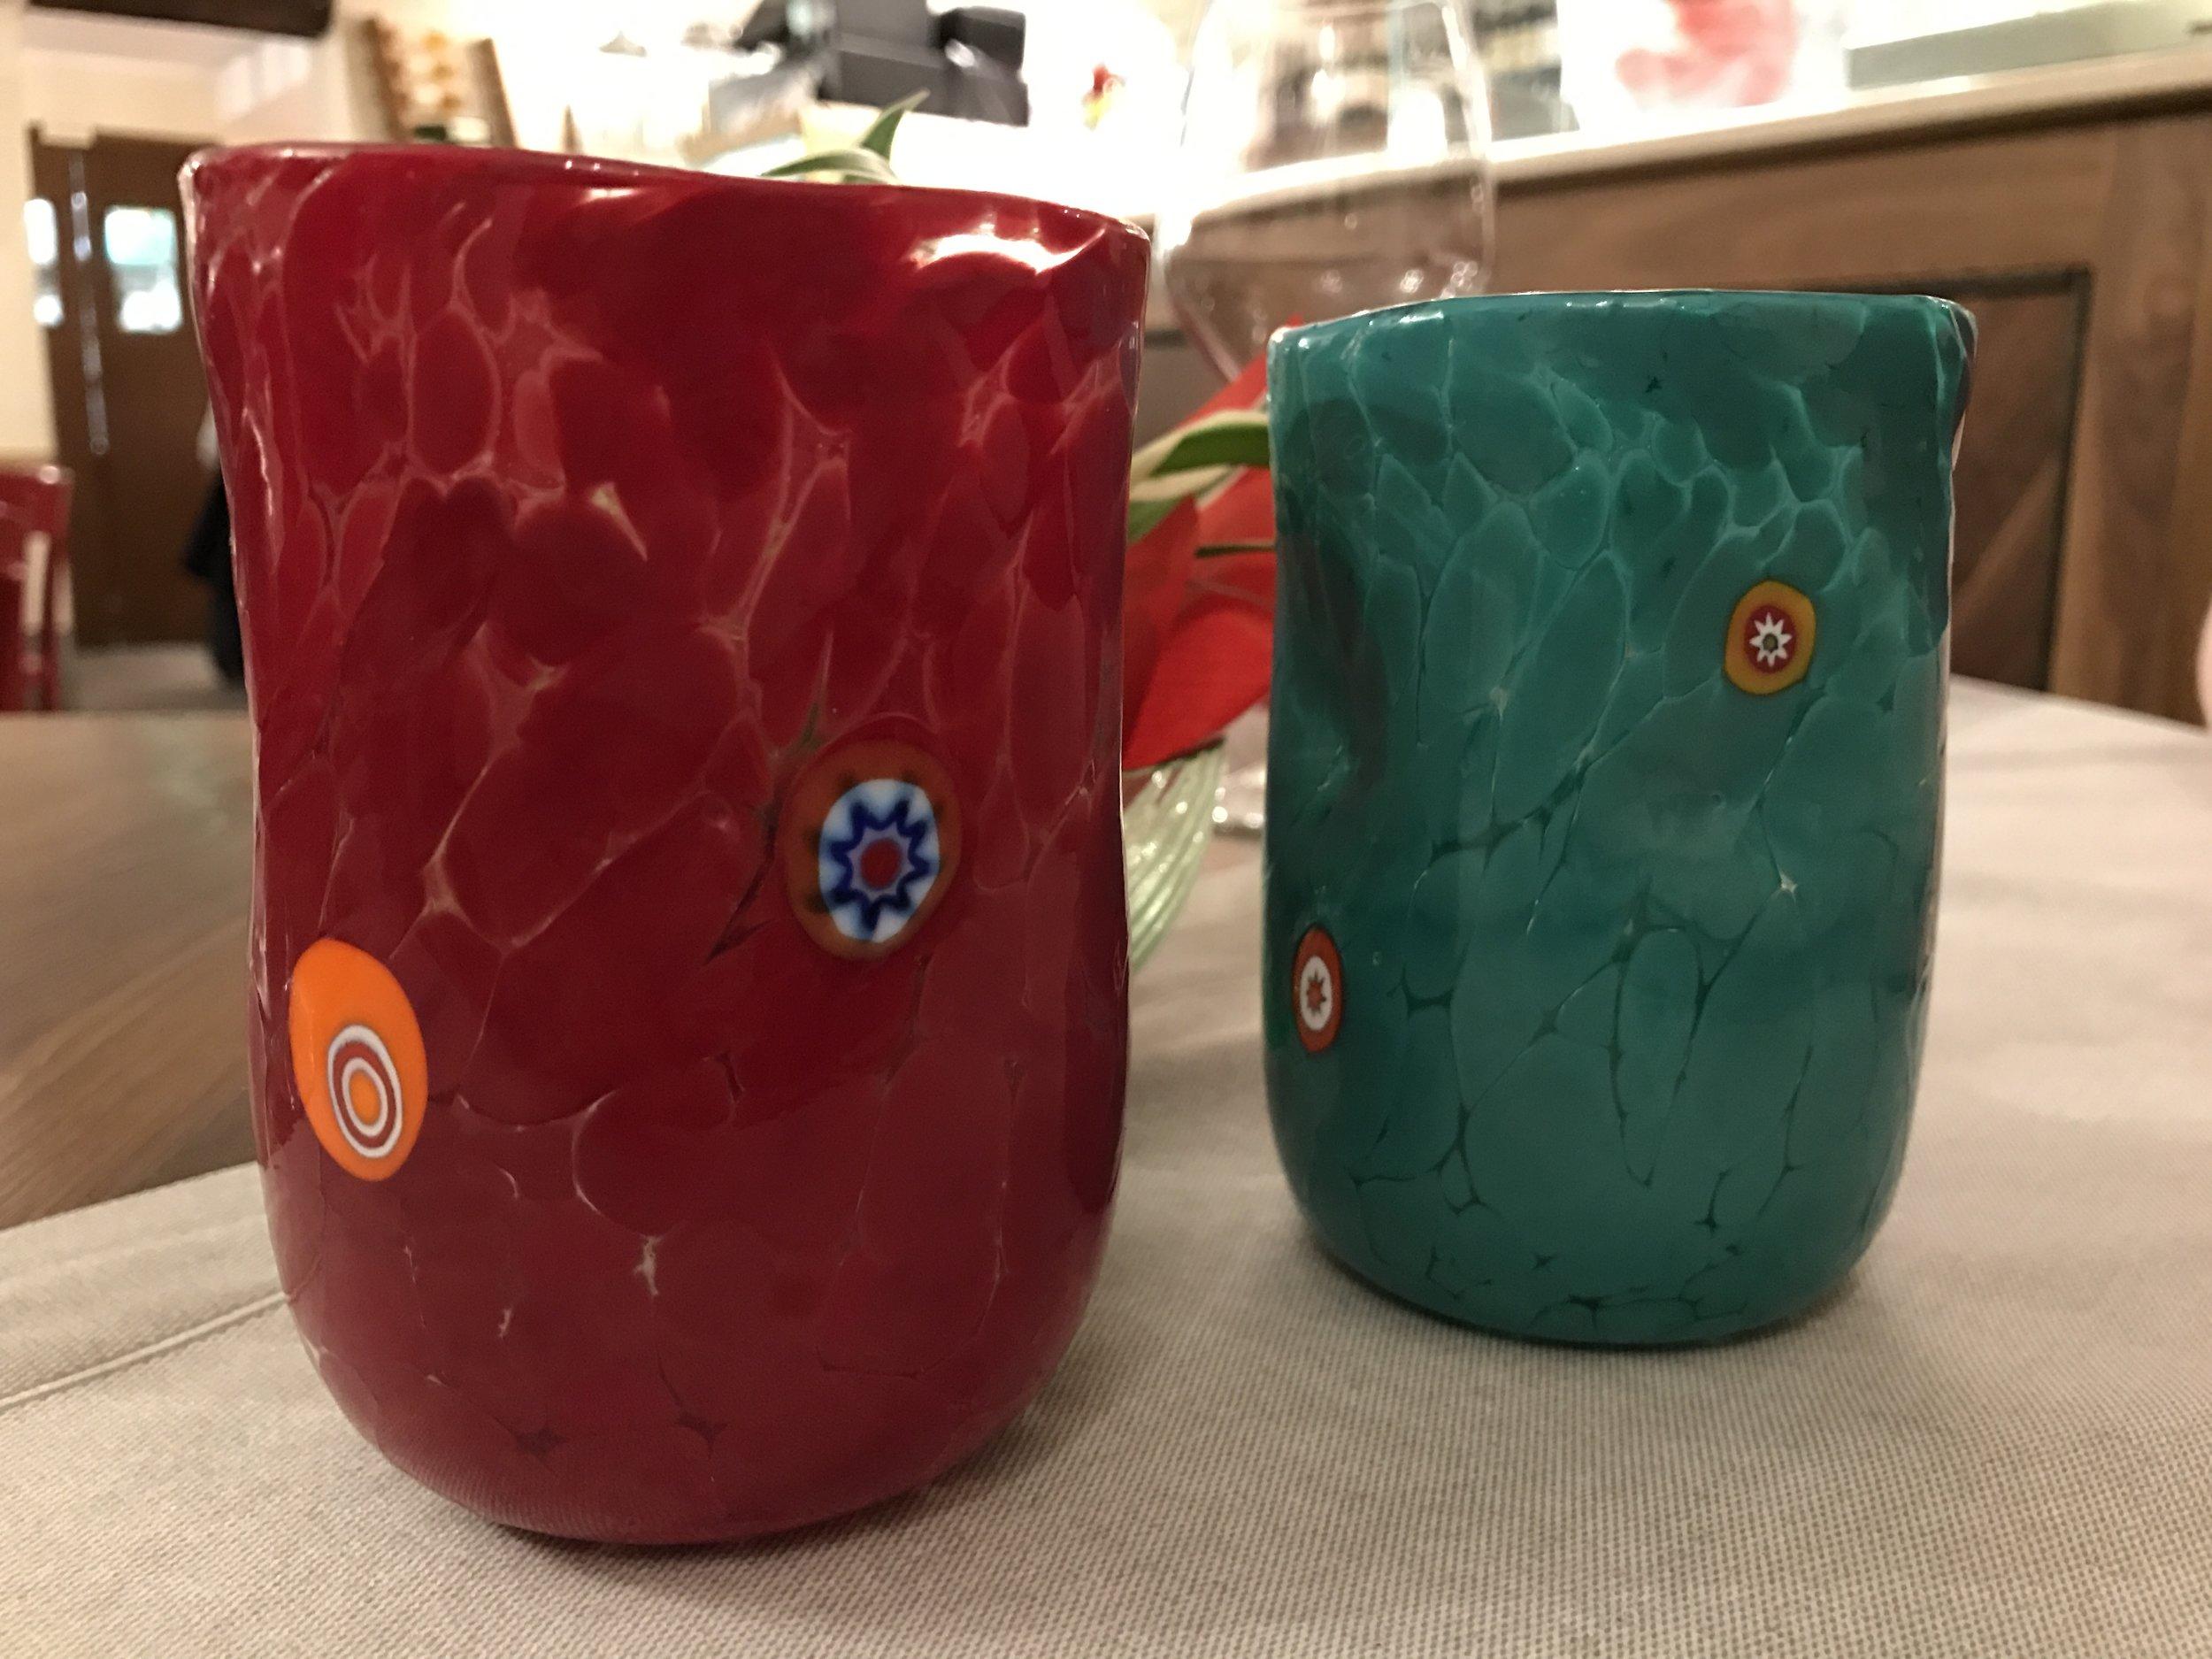 Murano-made water glasses. Beautiful and functional!